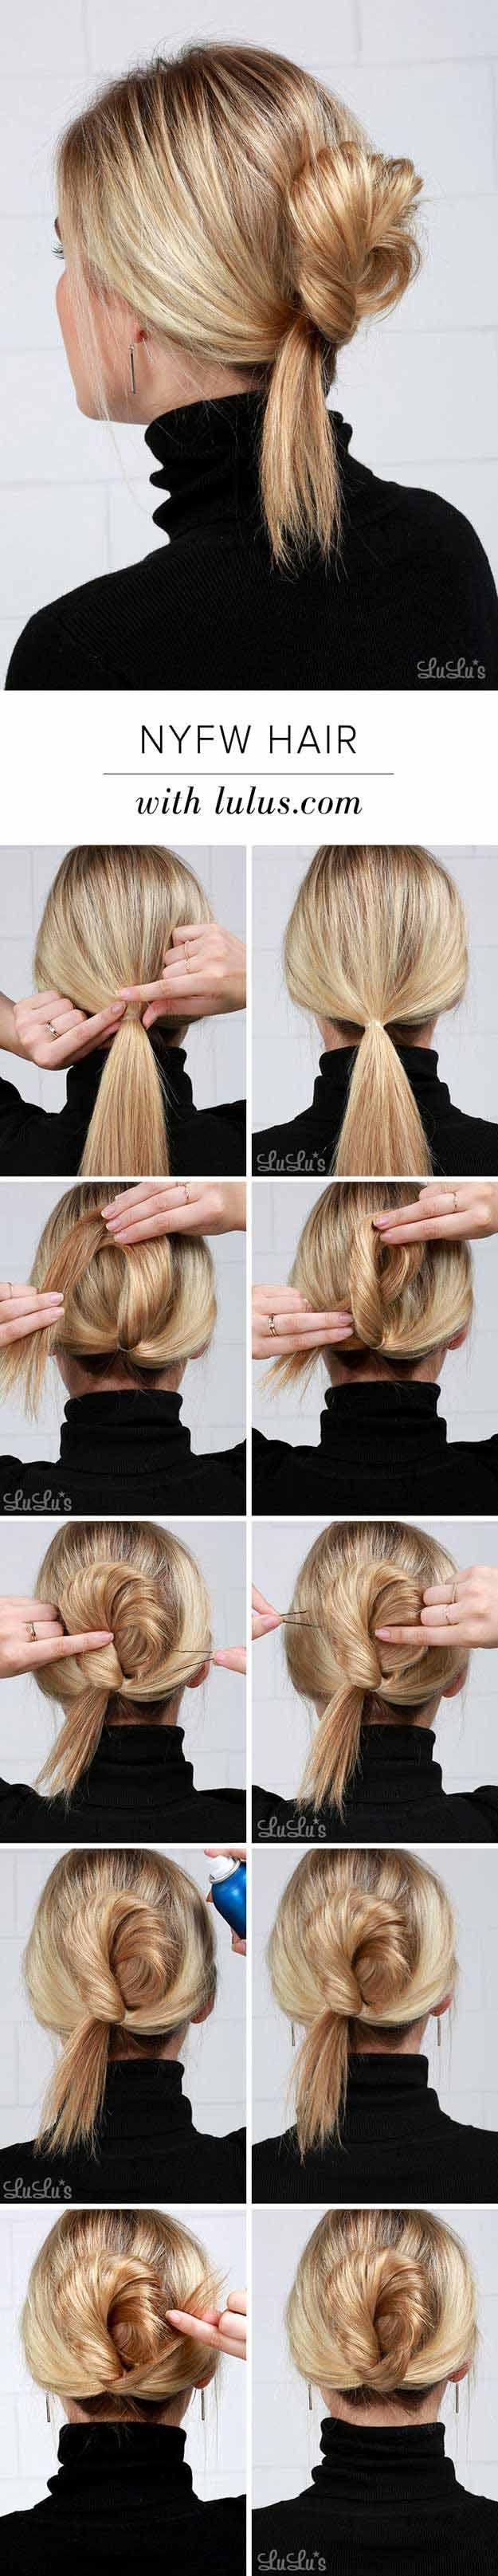 352 best Hair Styles images on Pinterest